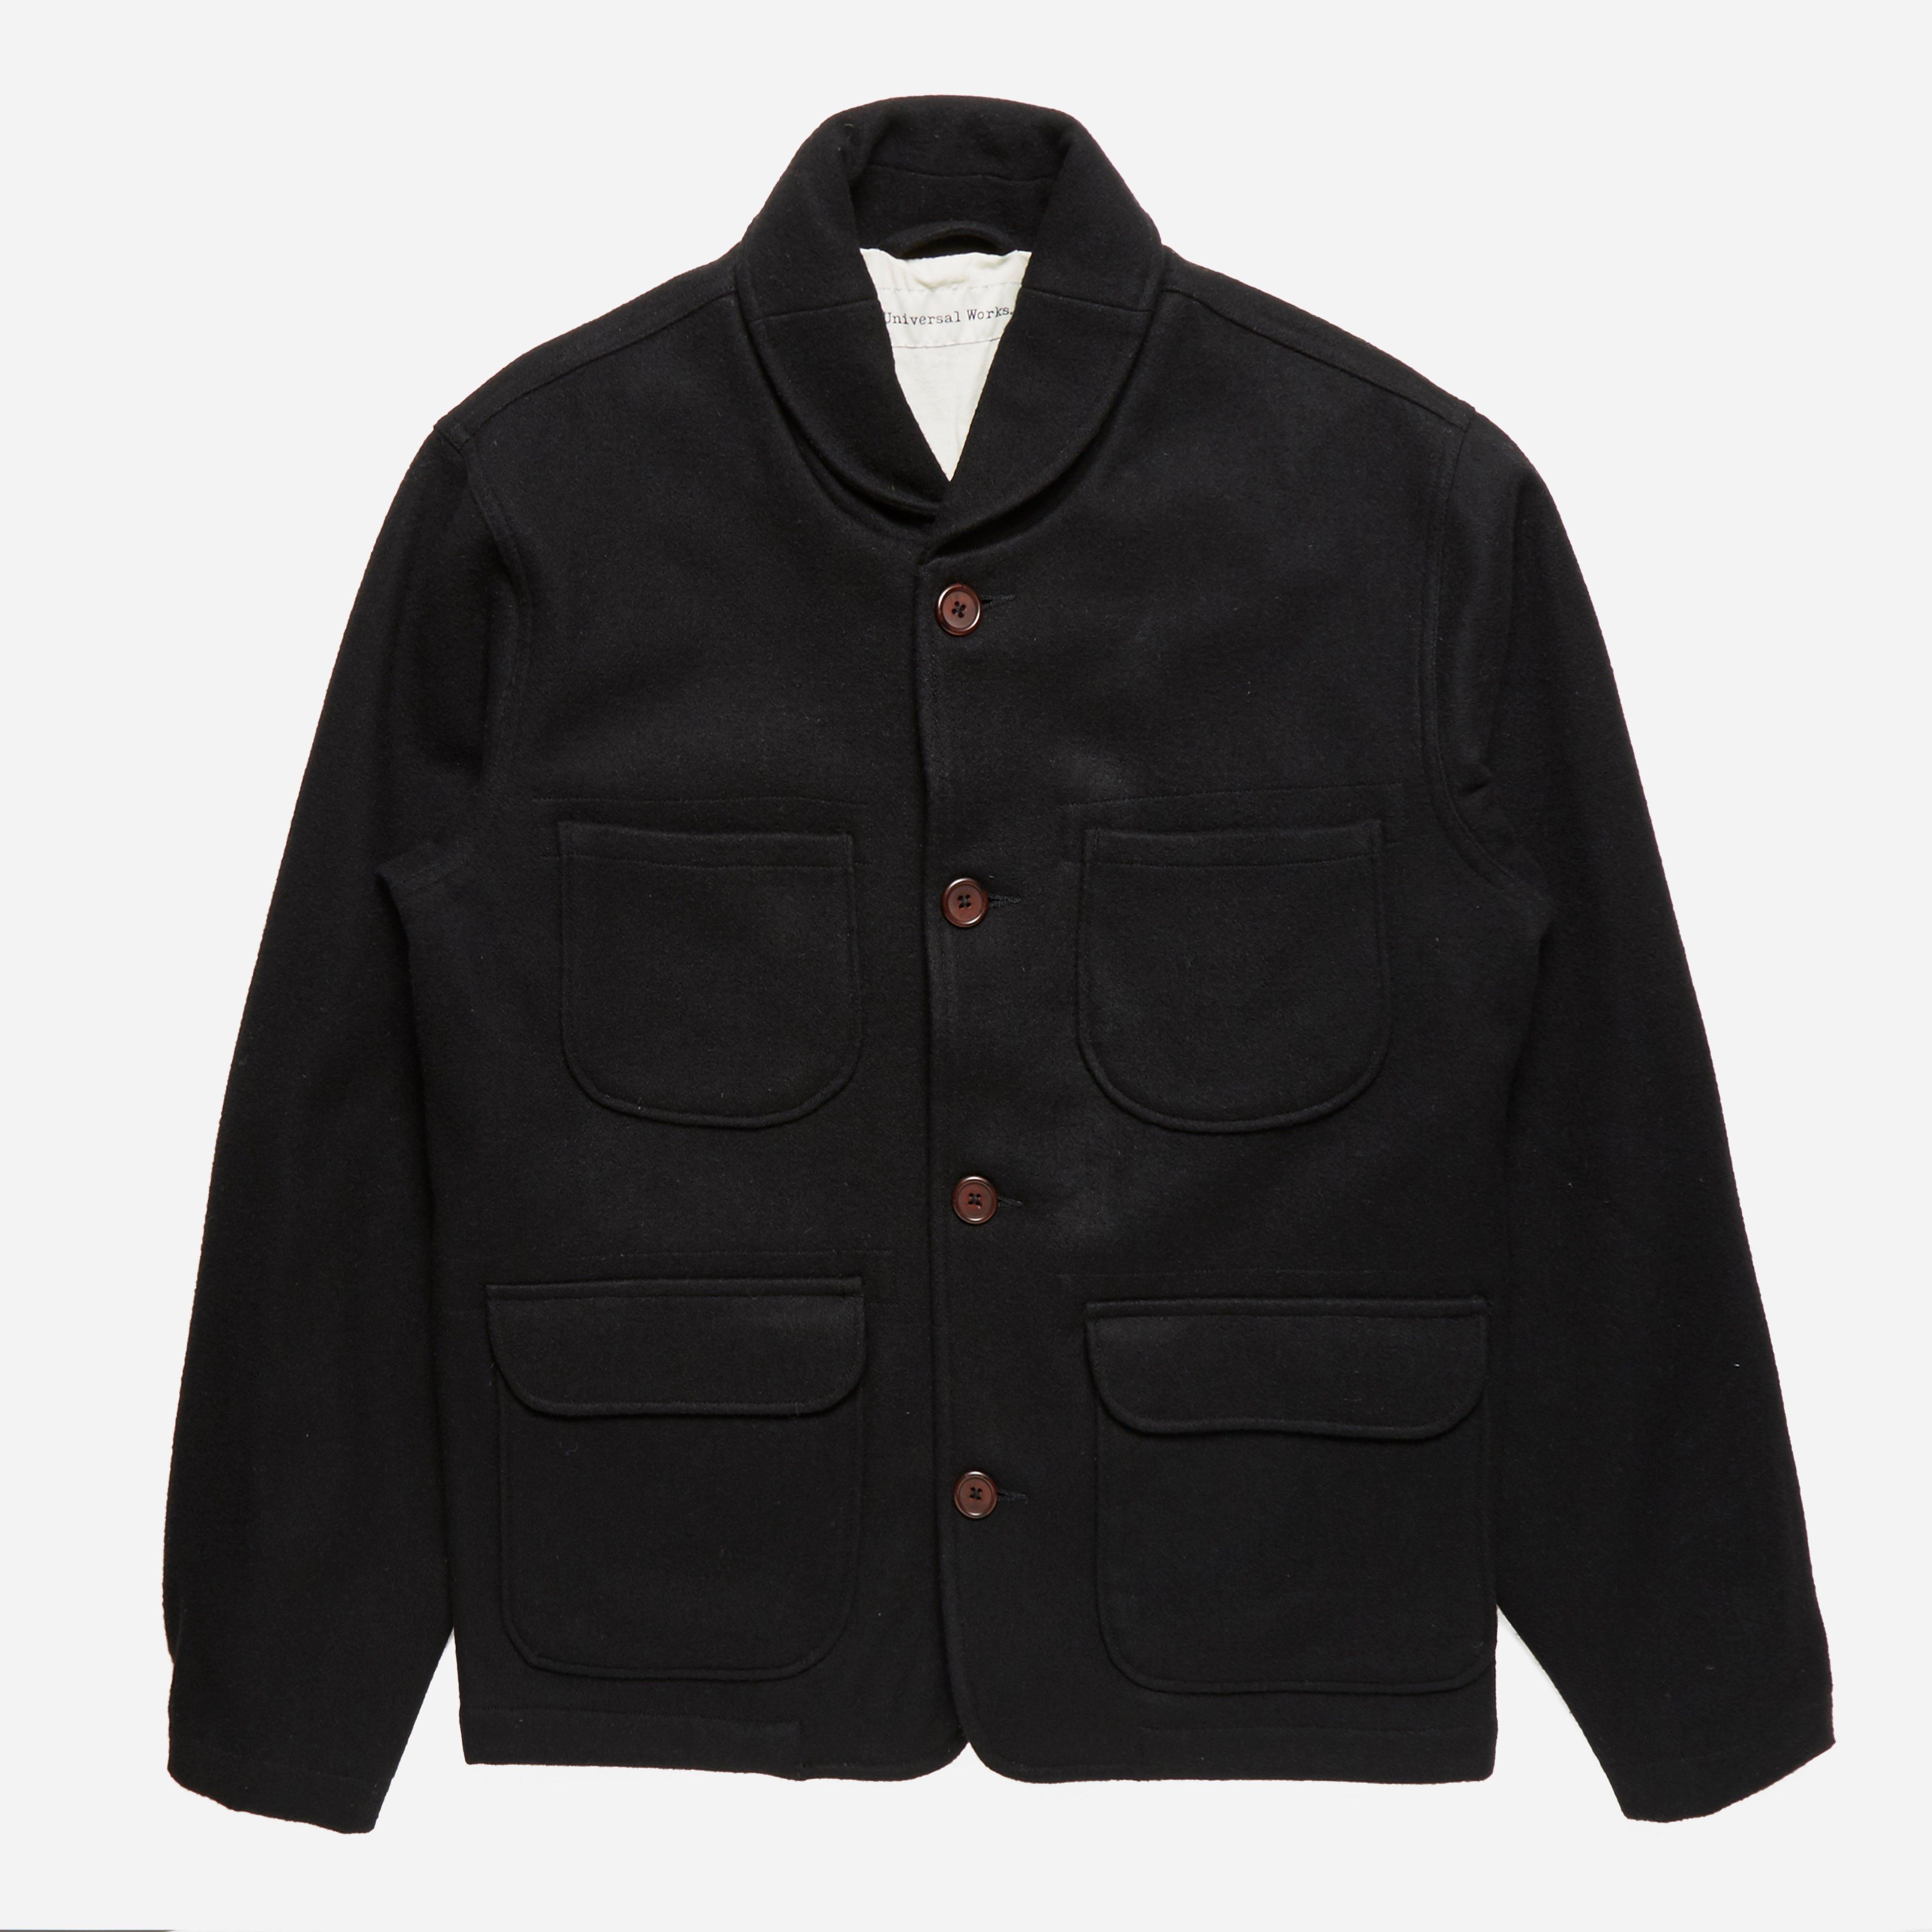 Universal Works Labour Jacket